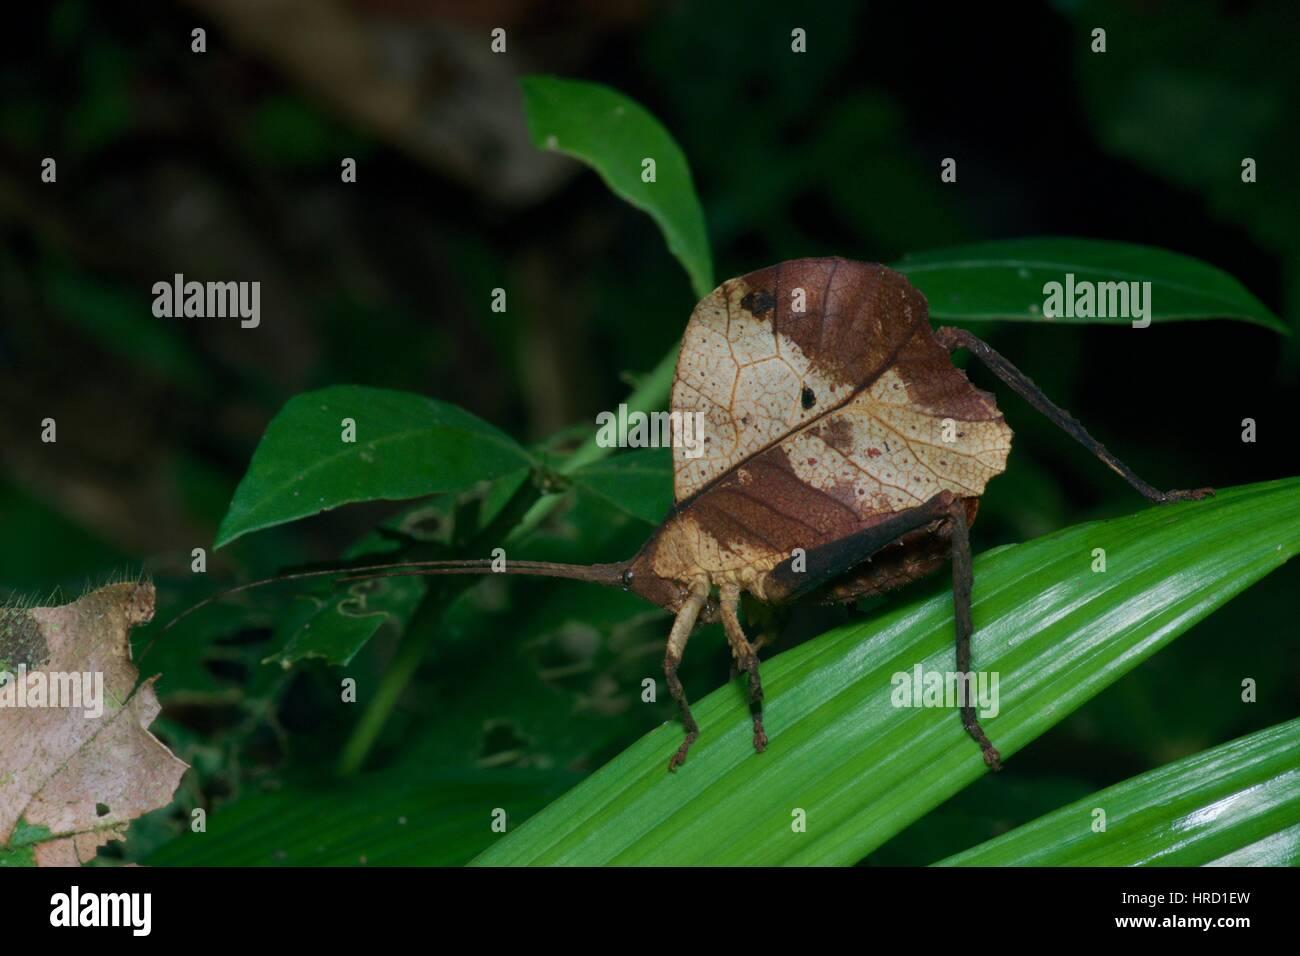 A dead-leaf mimic katydid (Typophyllum sp.) on a leaf in the Amazon rainforest at night in Loreto, Peru - Stock Image